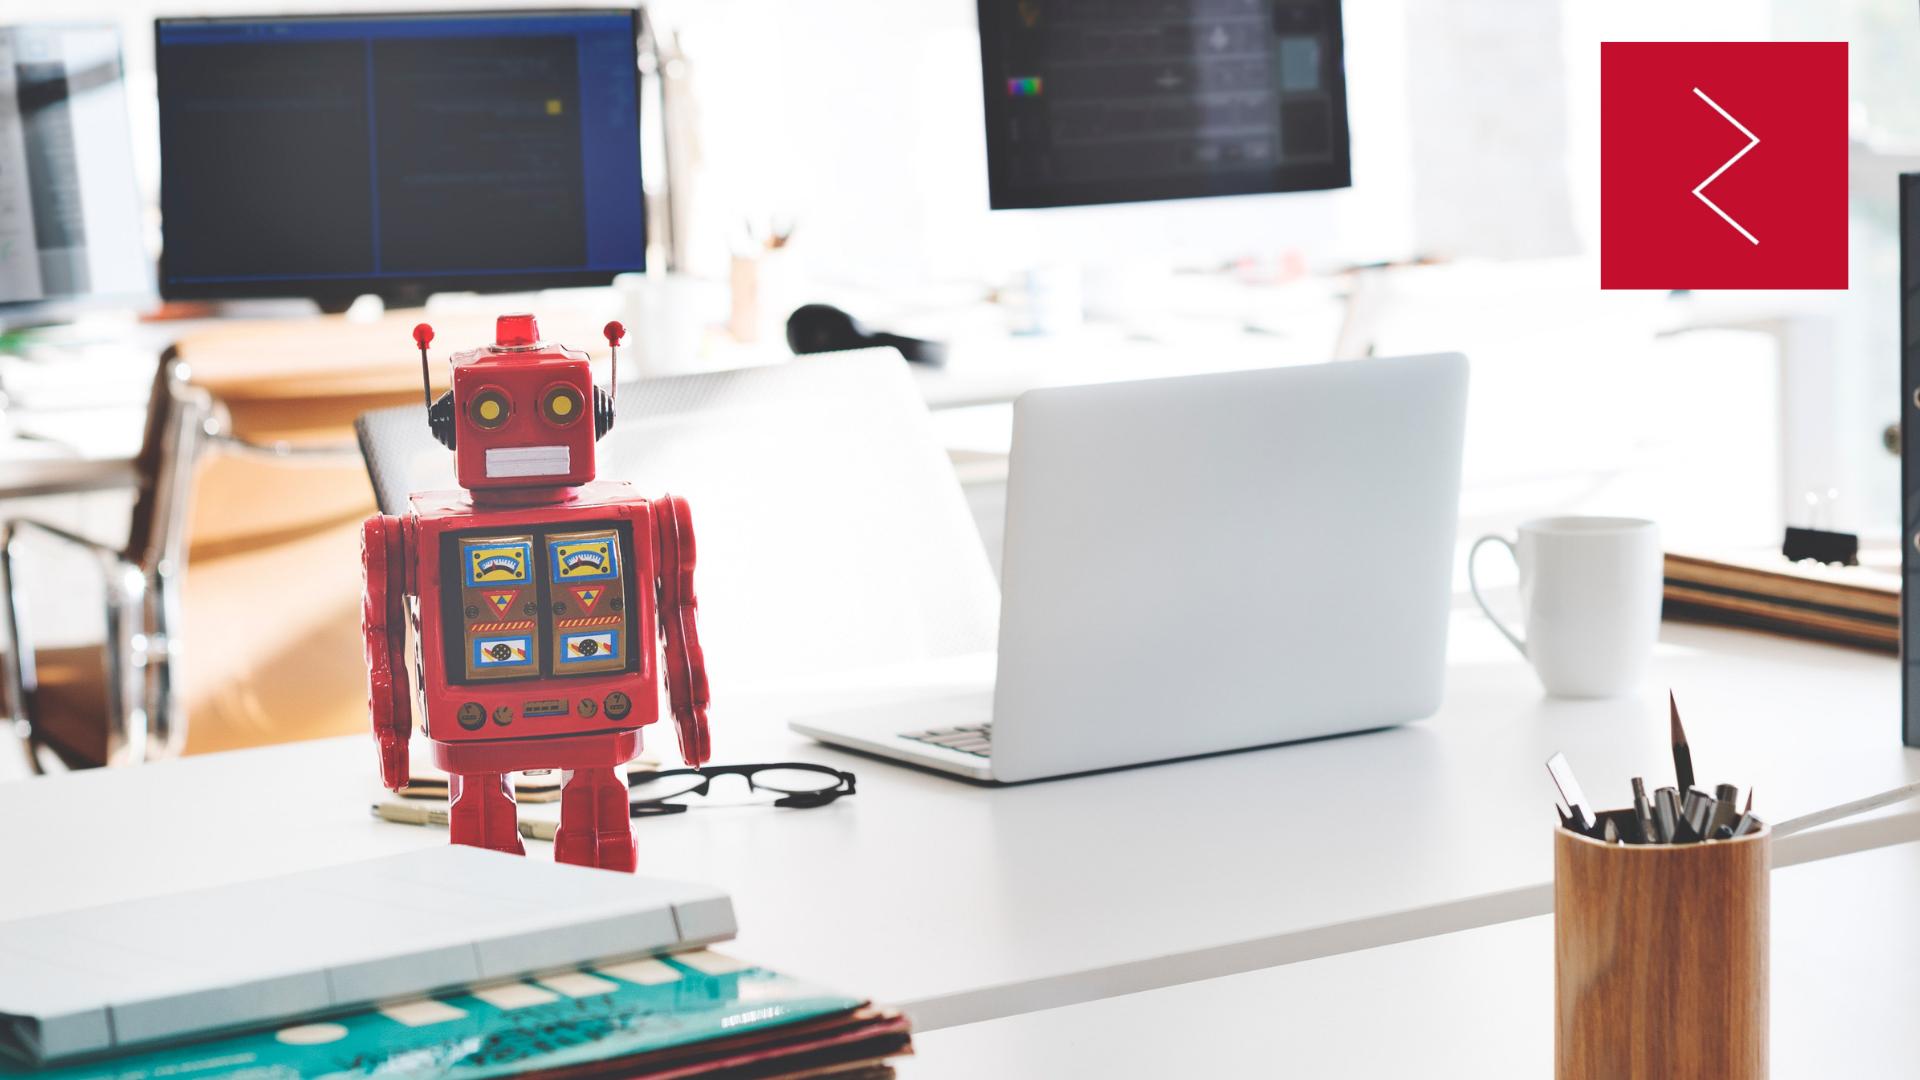 Boardroom robot